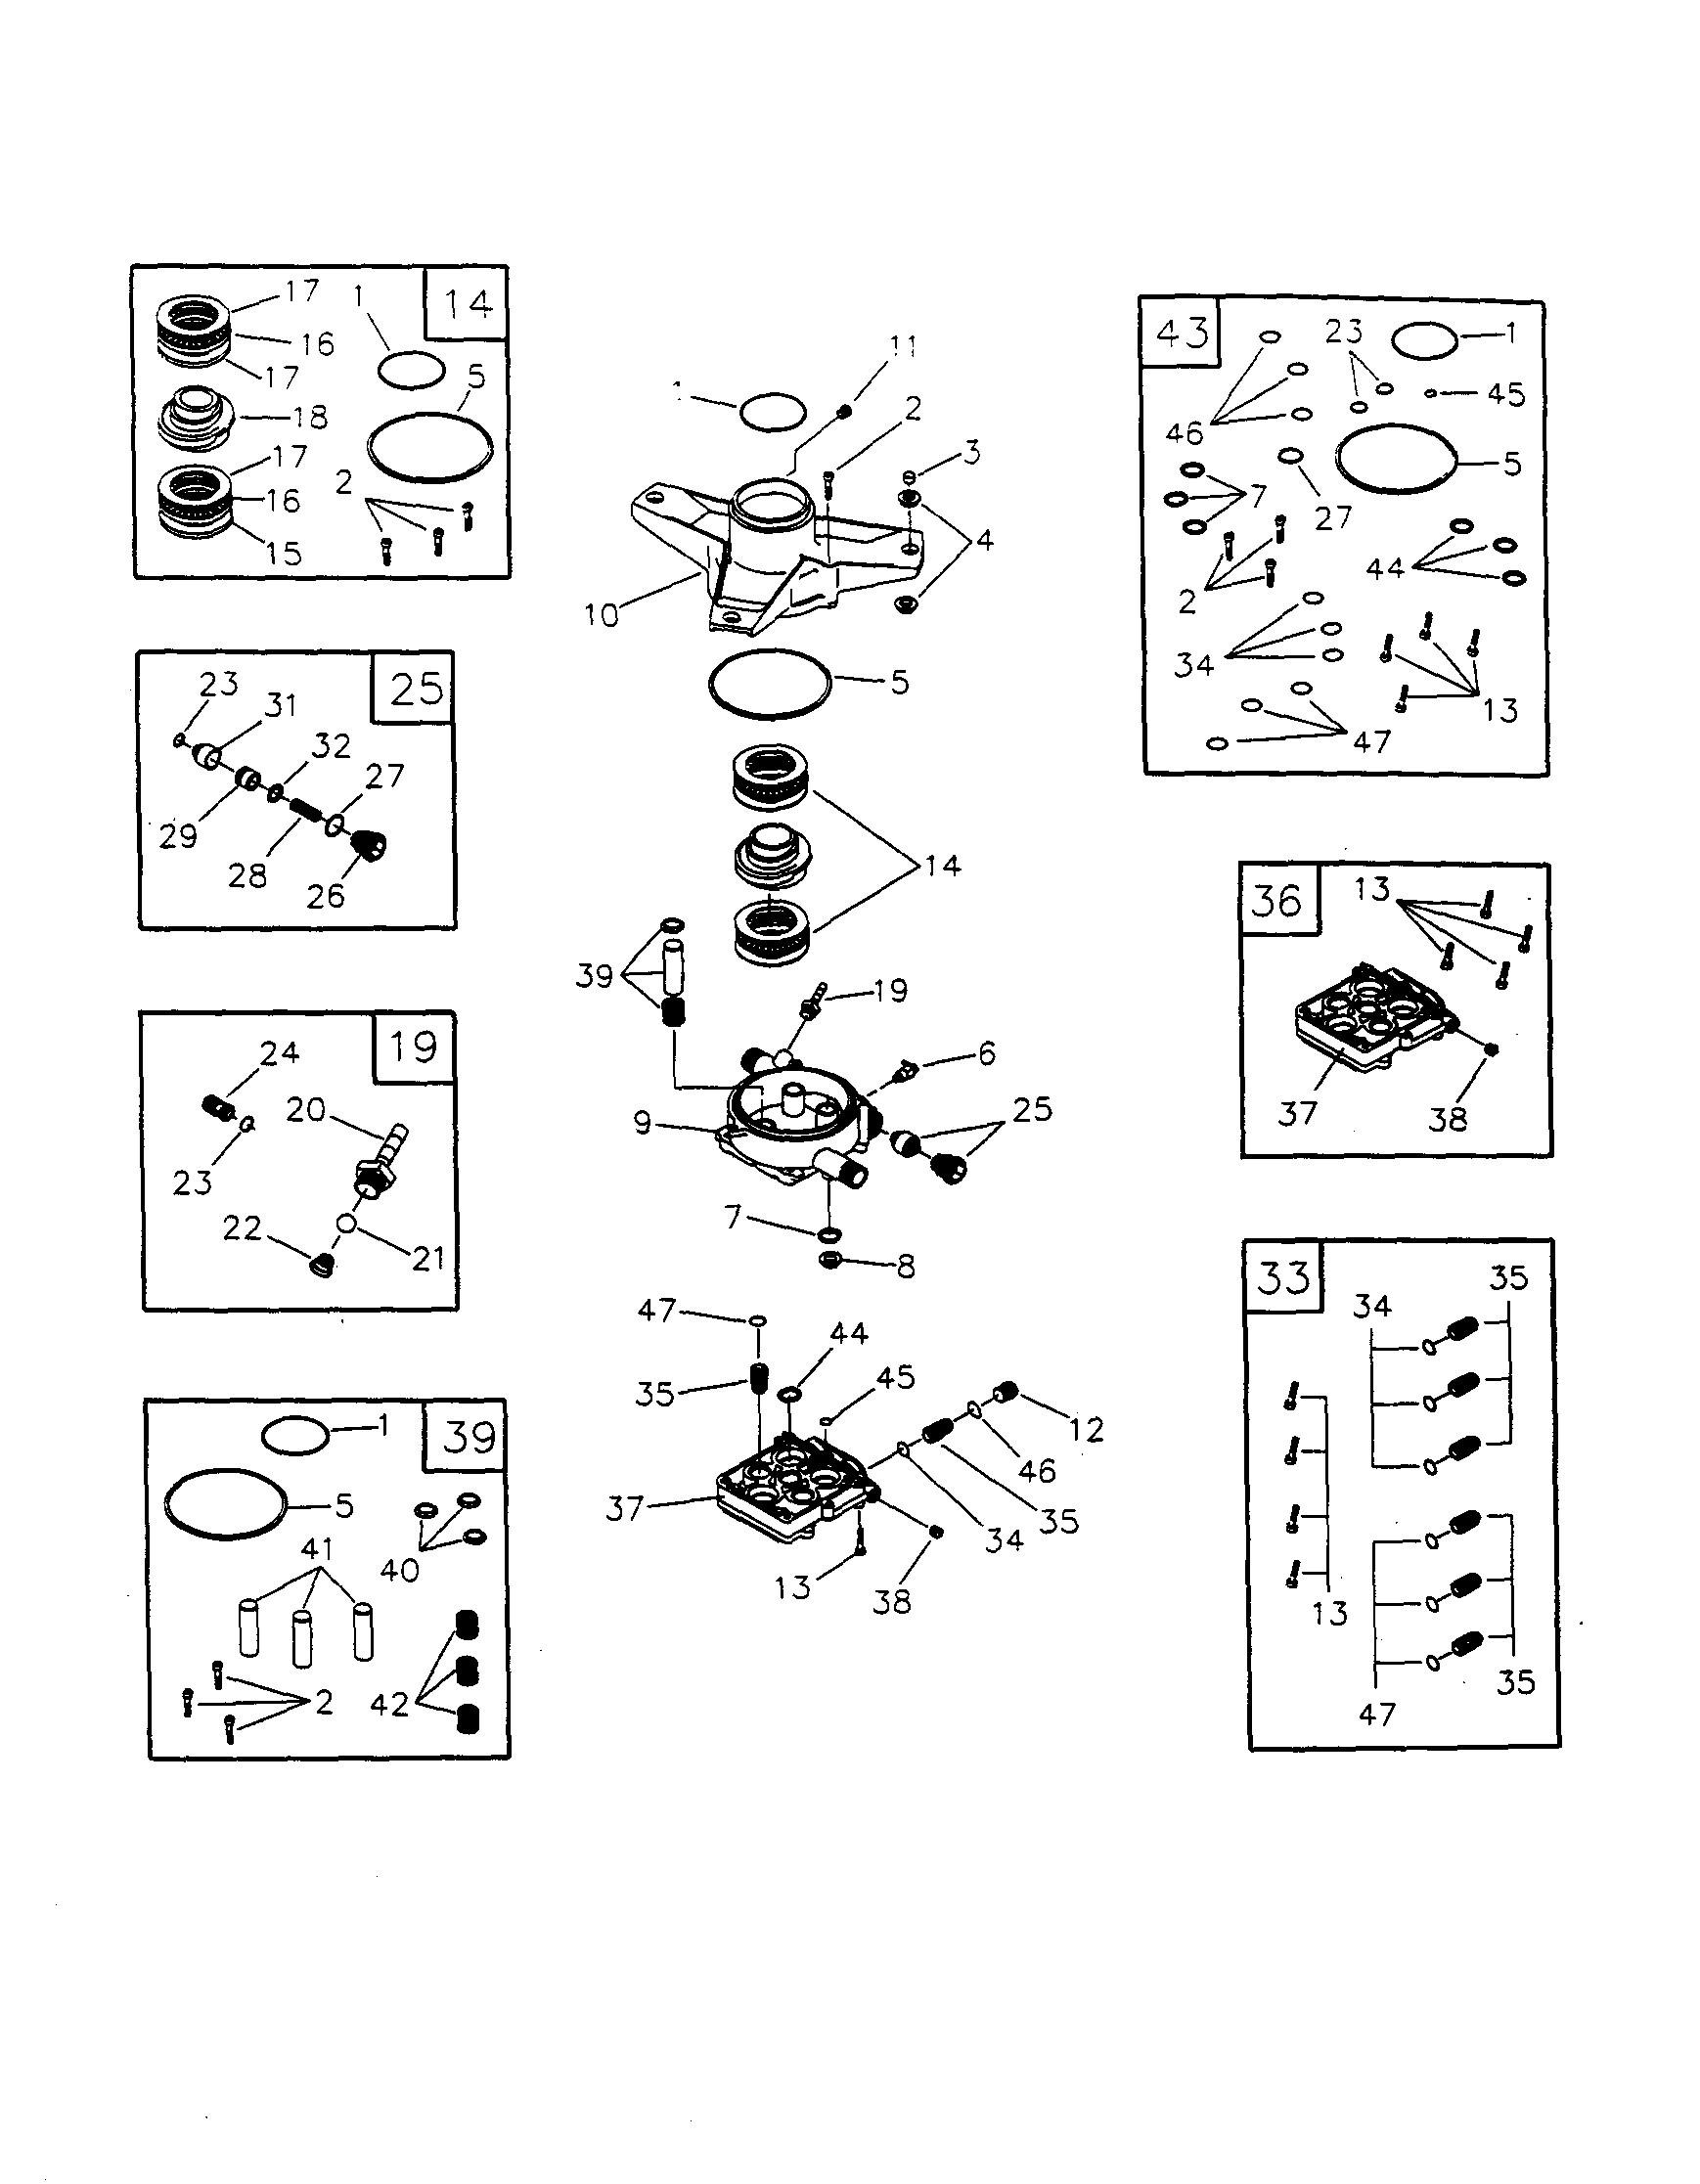 hight resolution of honda gcv160 engine parts diagram reviewmotors cohonda gcv160 engine parts diagram gc160